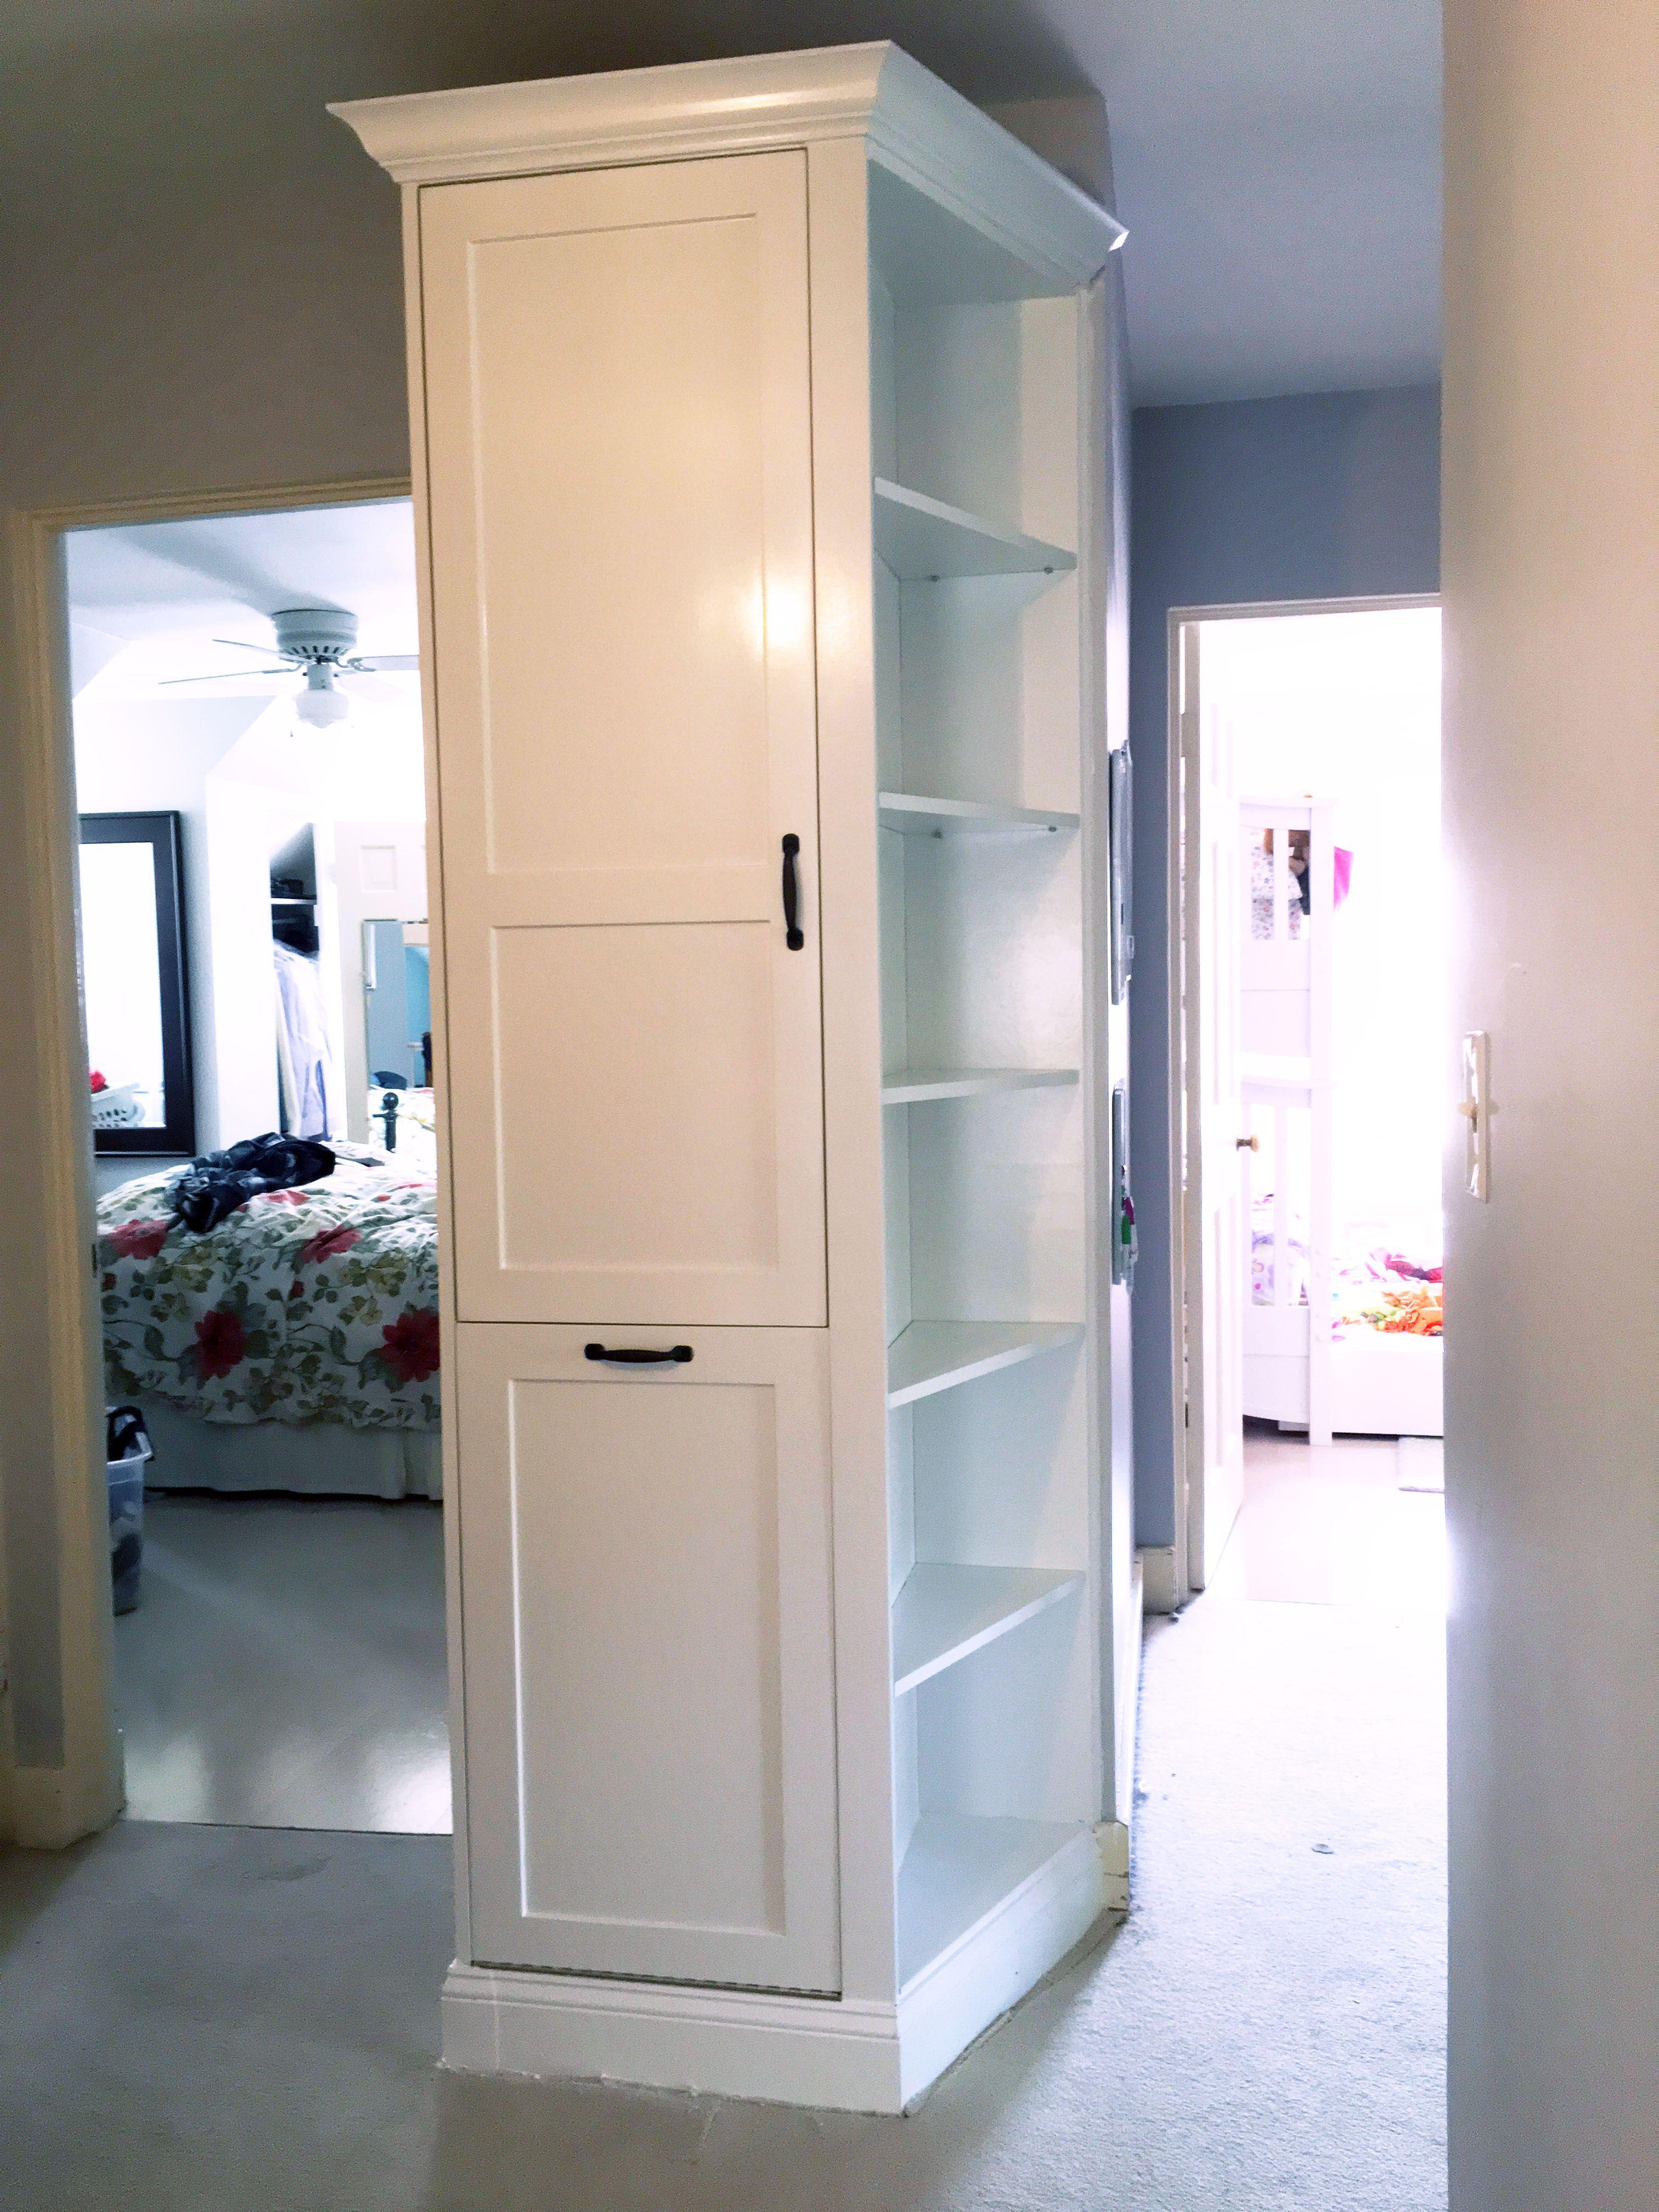 Custom Made Laundry Chute And Hall Storage Unit